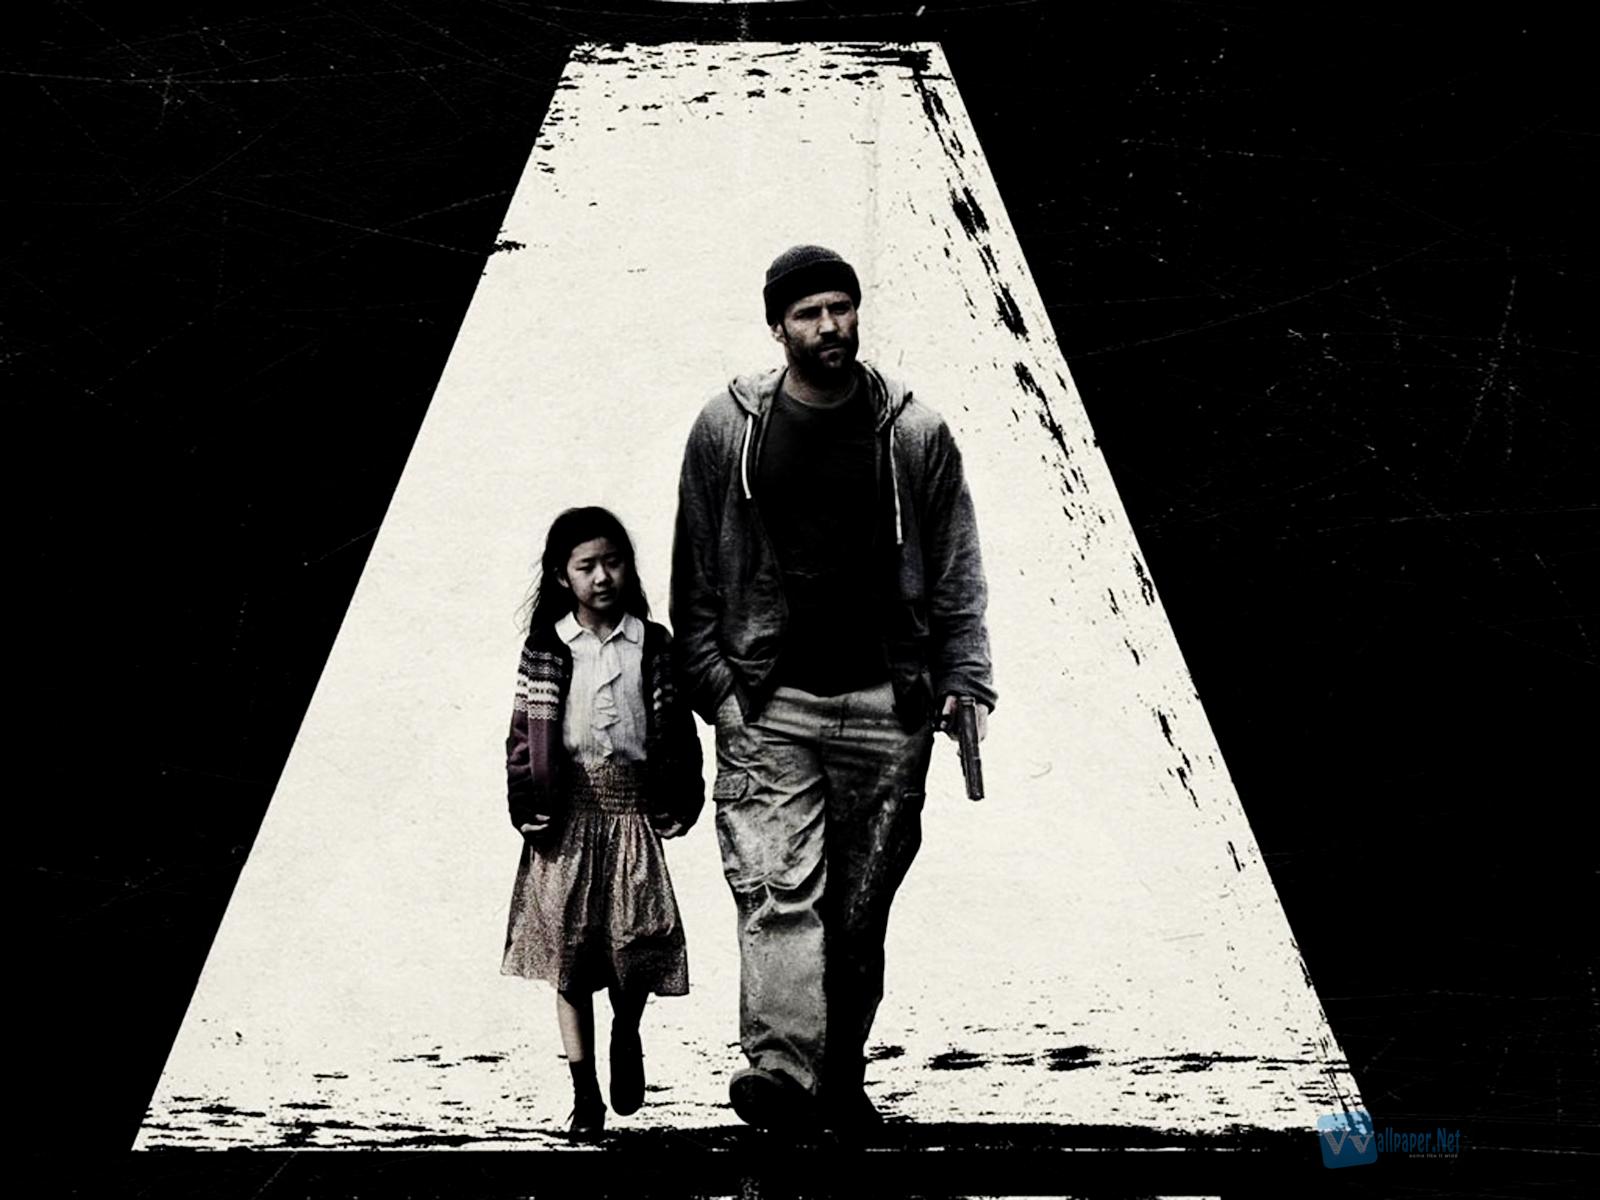 http://1.bp.blogspot.com/-YpjpUNVK3d4/Tr1dBsVCpTI/AAAAAAAAEXY/CAj7Y8HvNjE/s1600/Safe_Movie_2011_Jason_Statham_Poster_Wallpaper_Vvallpaper.Net.jpg